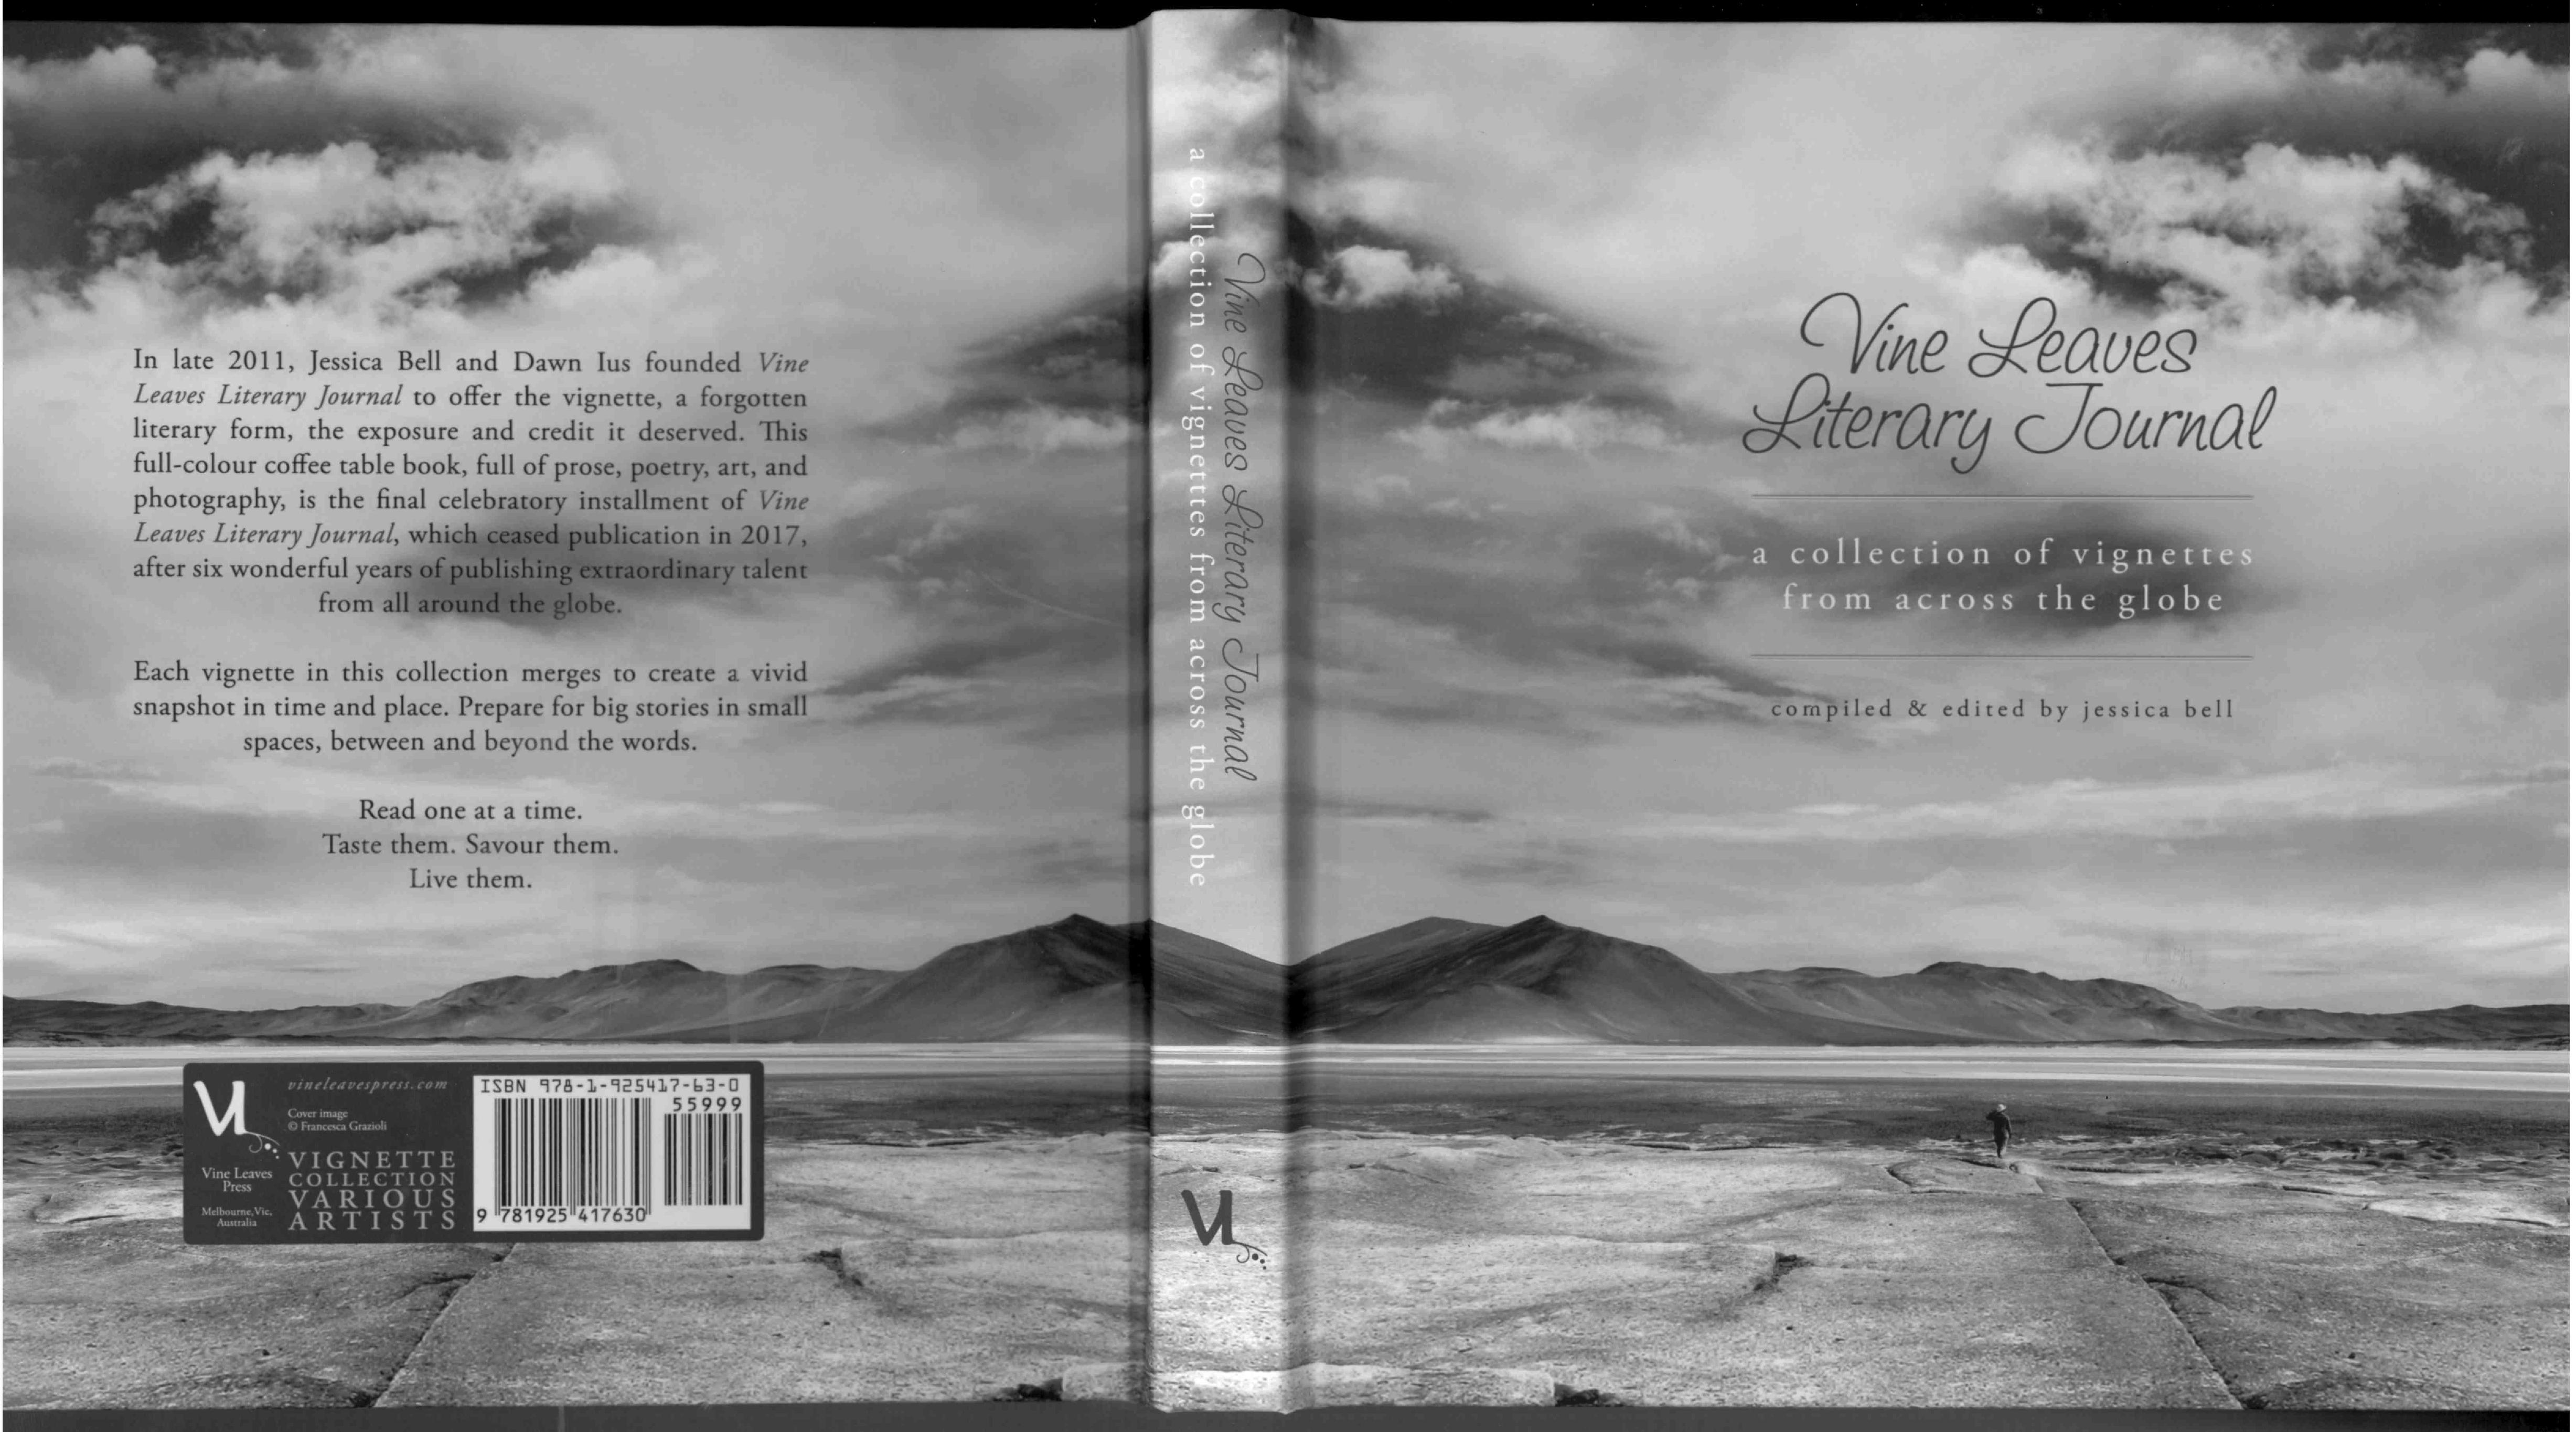 Rohan Quine in 'Vine Leaves Literary Journal' (Nov 2017) - 1